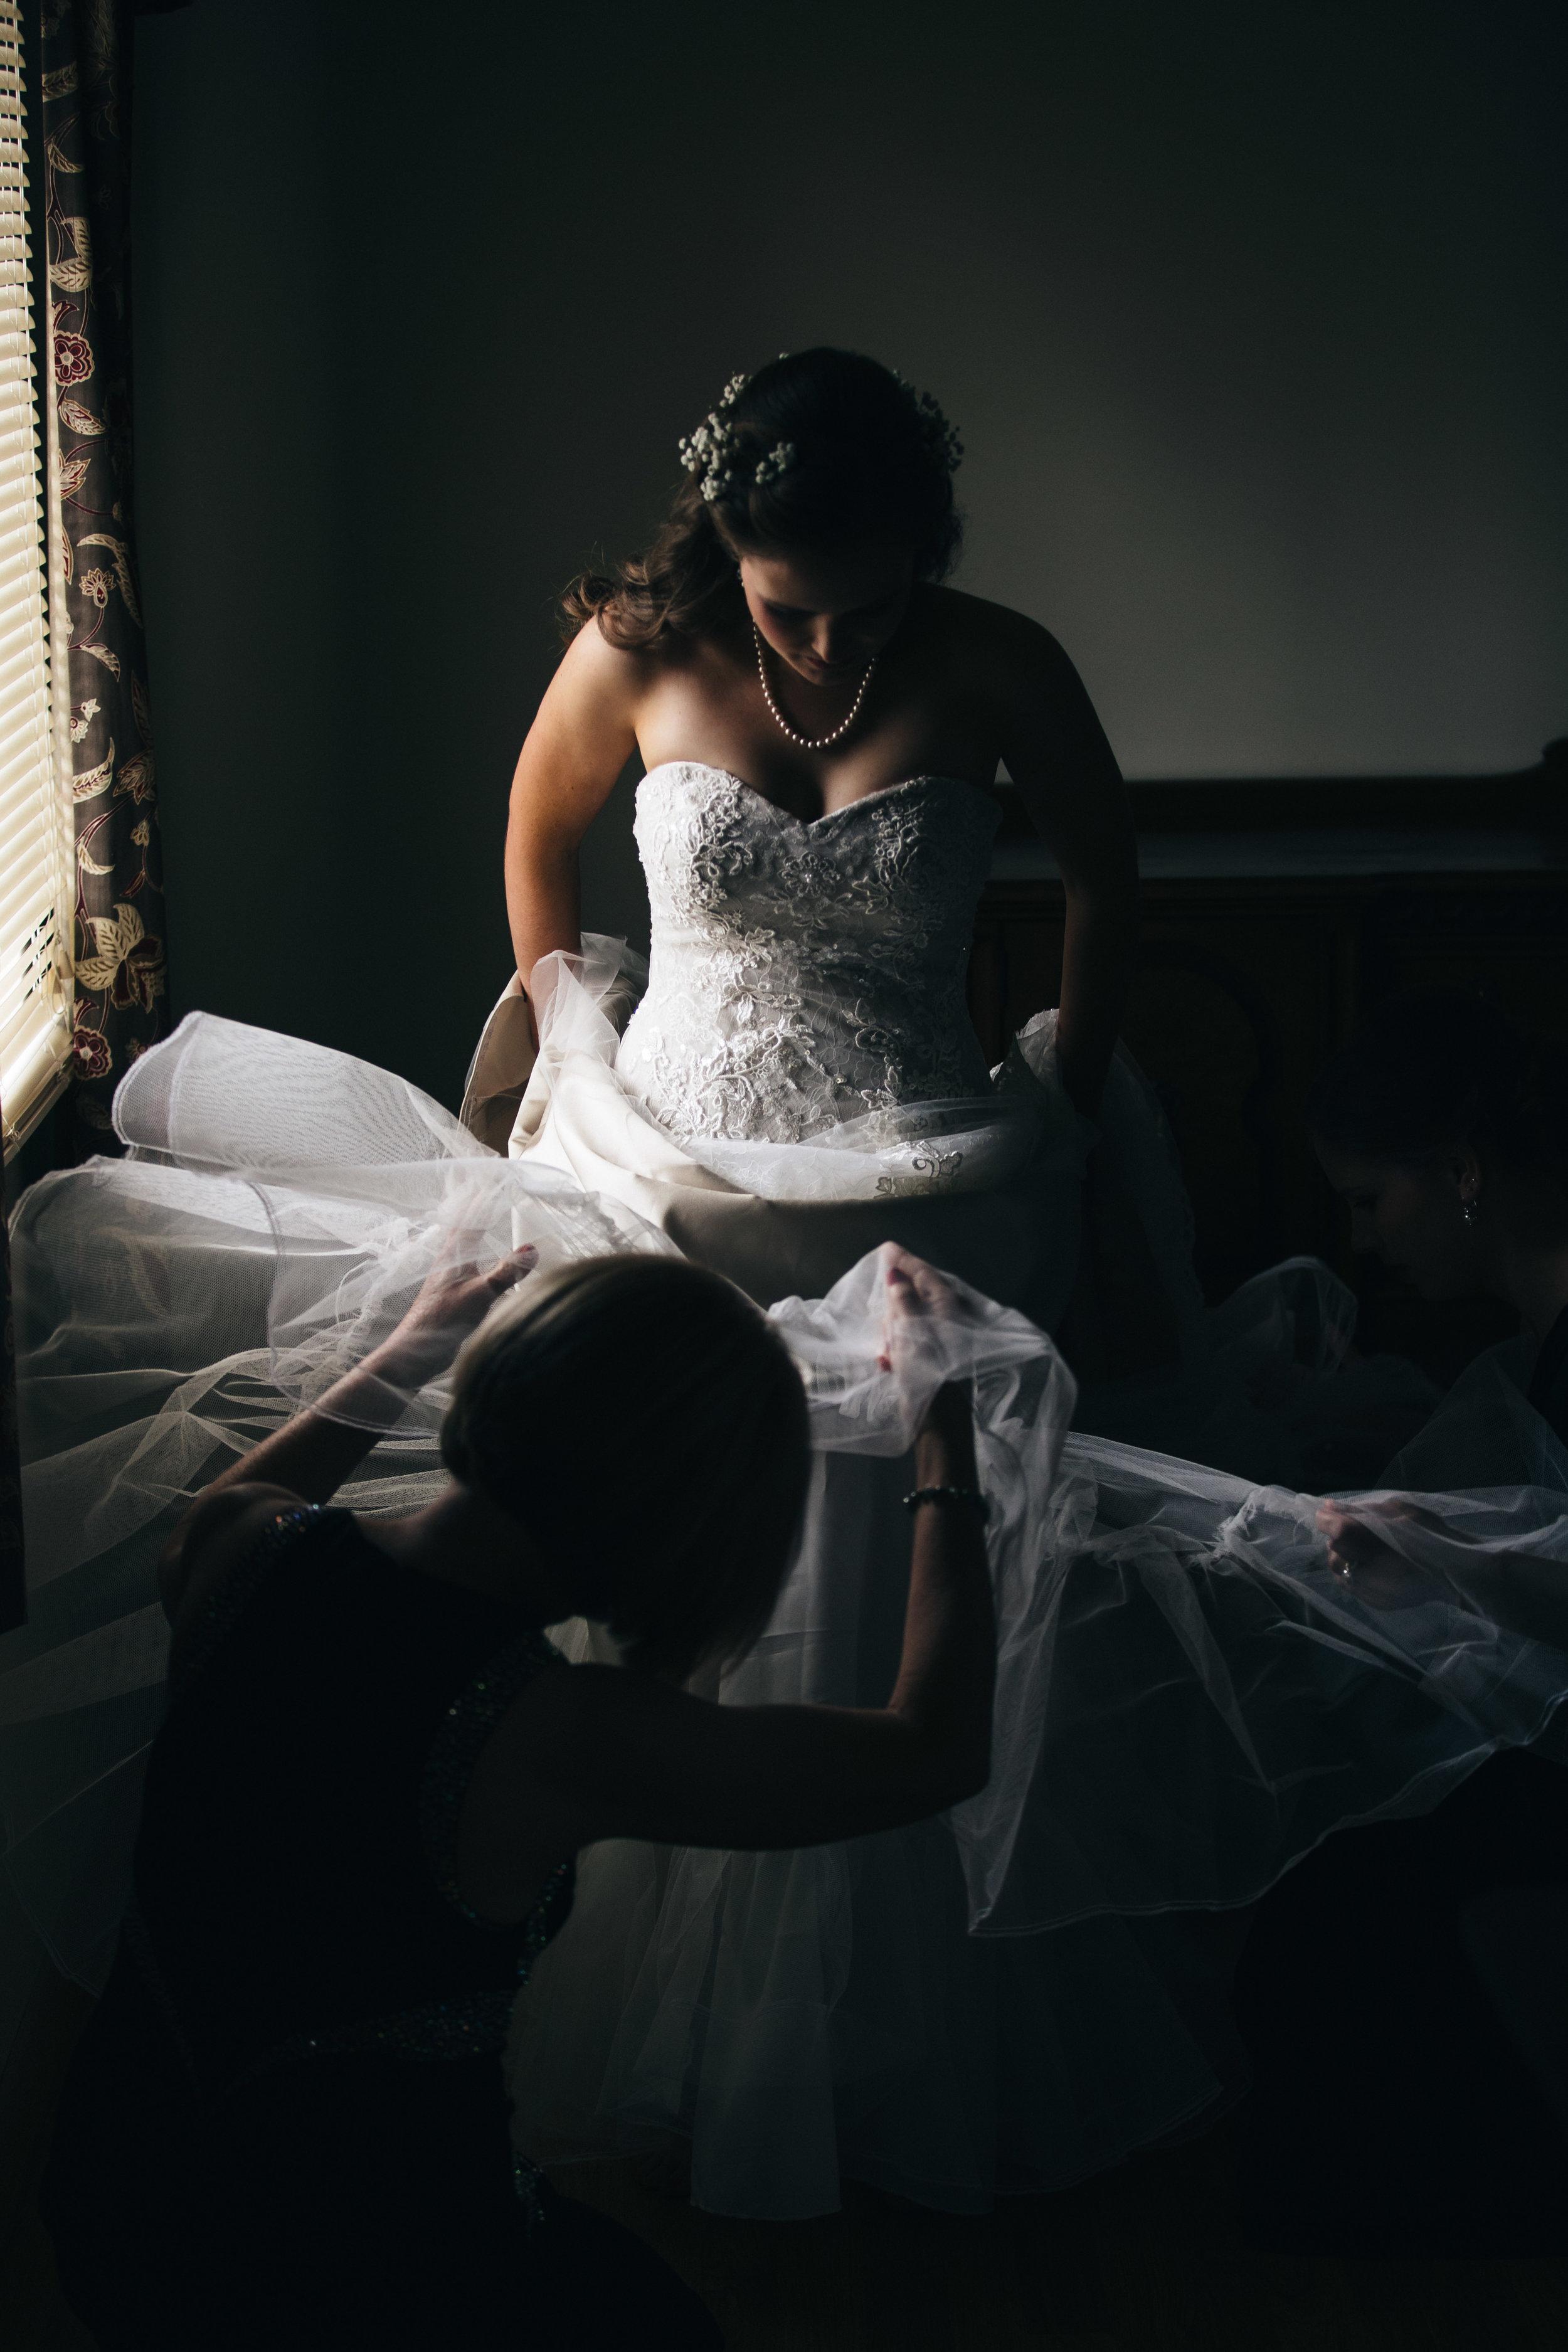 Bride getting into wedding dress.